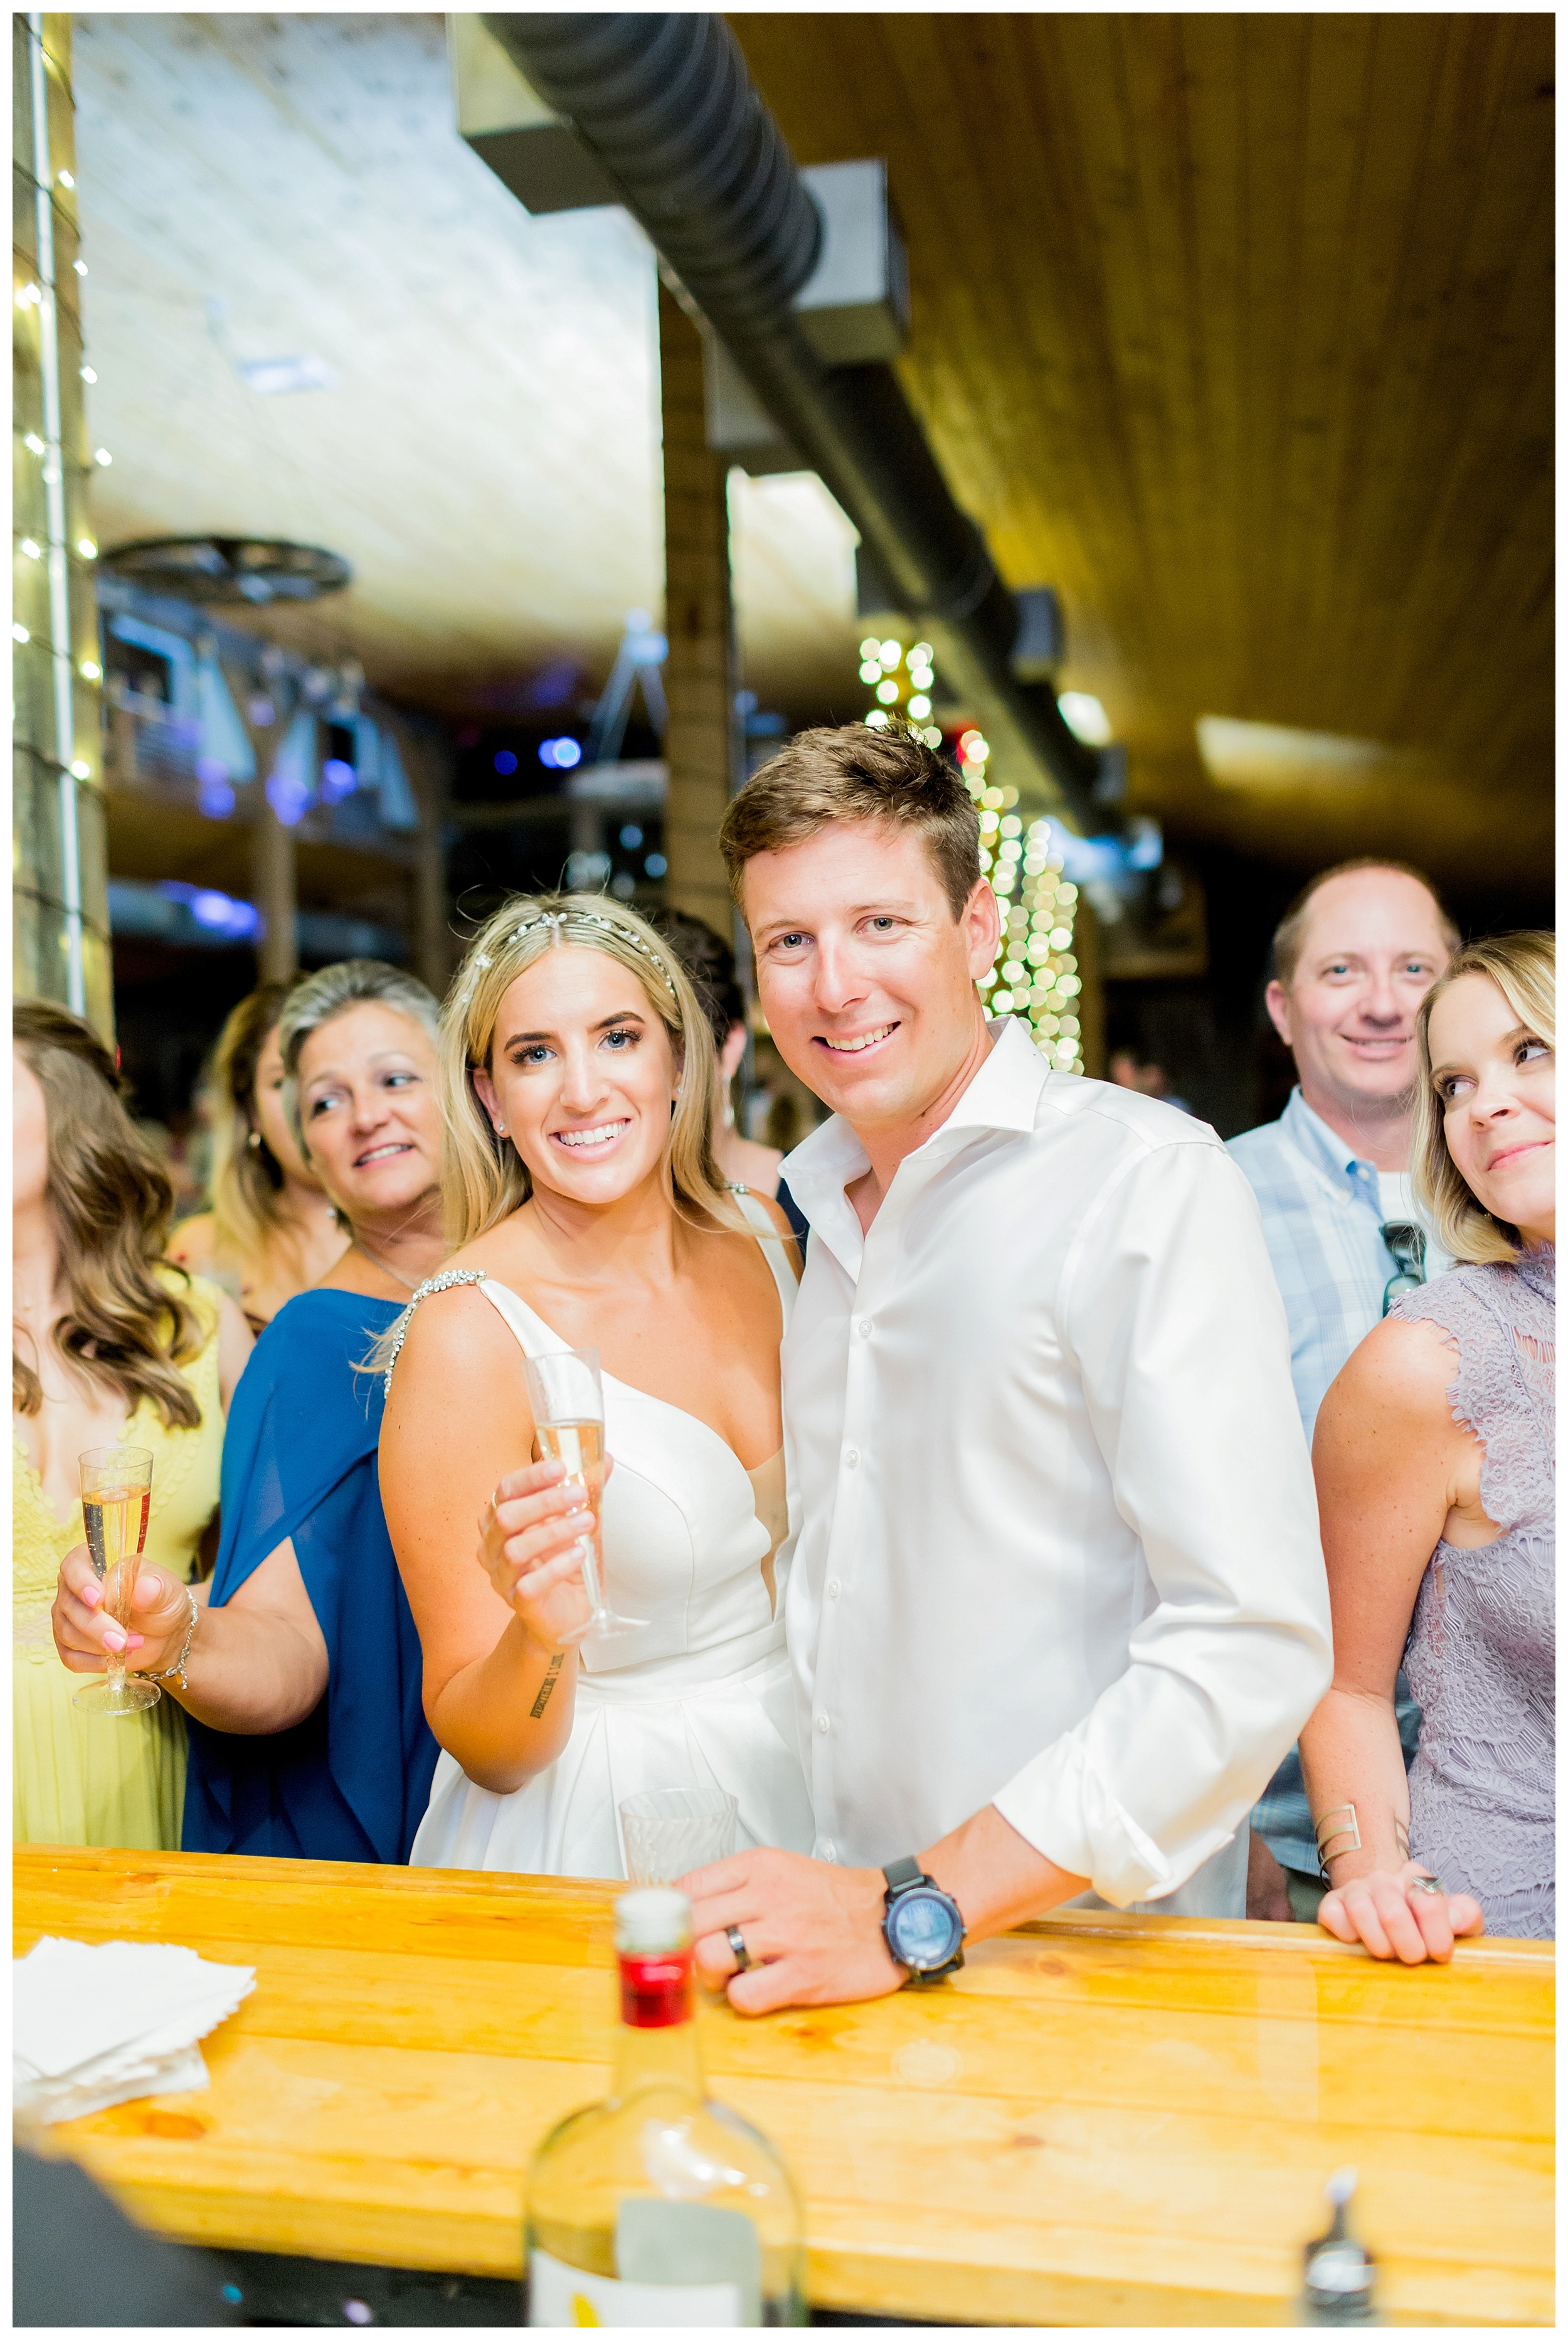 South Florida Wedding Photographer Kir Tuben_0110.jpg